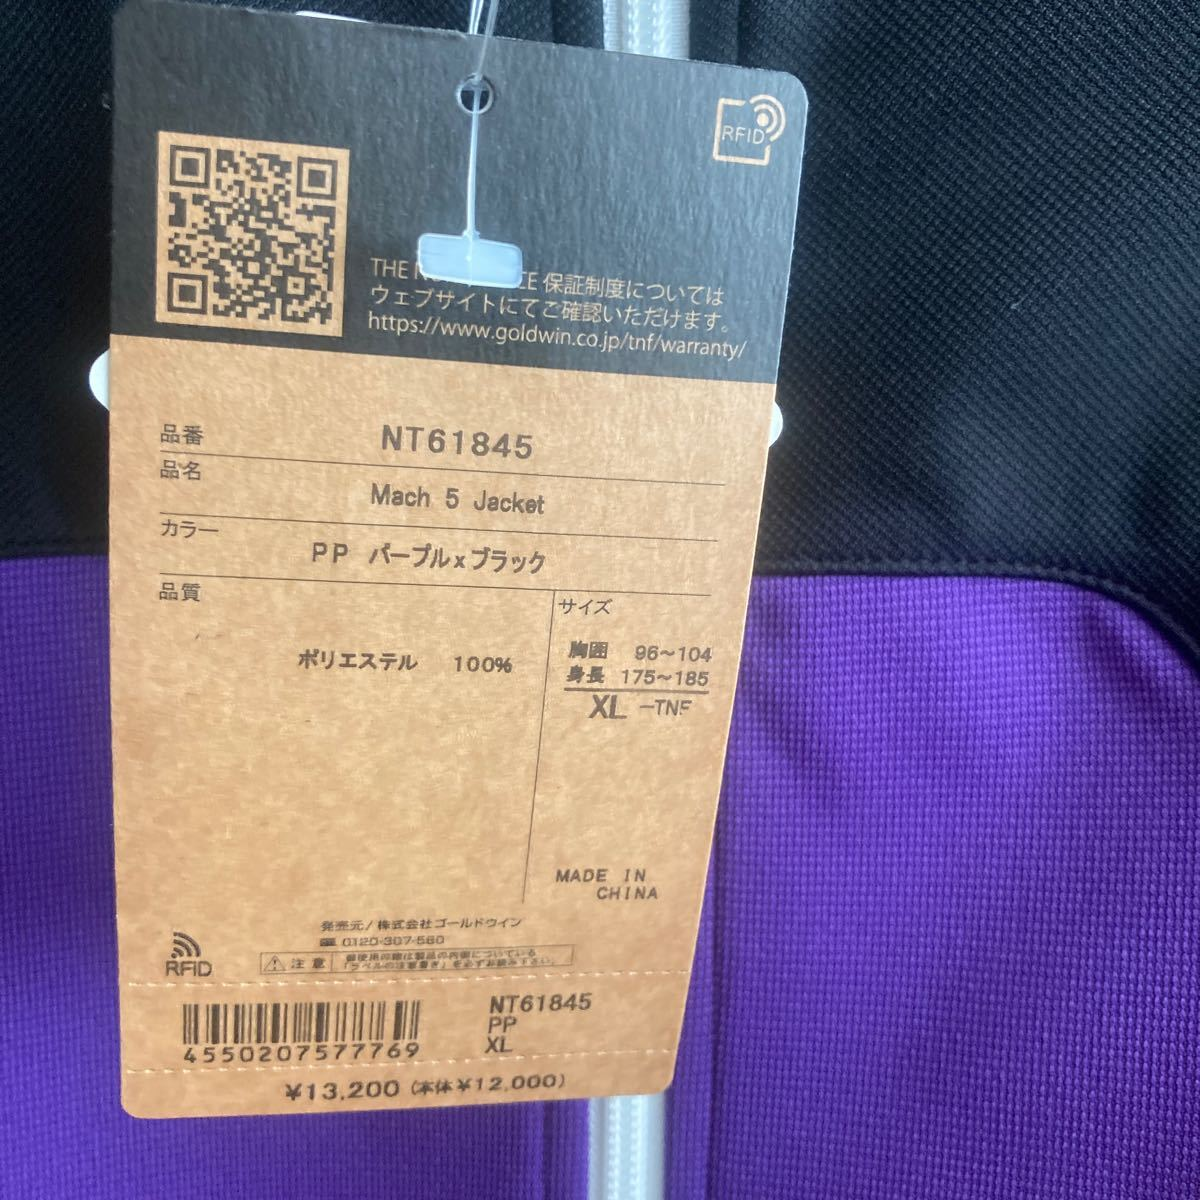 THE NORTH FACE ザノースフェイス JACKET Mach 5 Jacket XL 未使用美品 ピークパープル 紫×黒